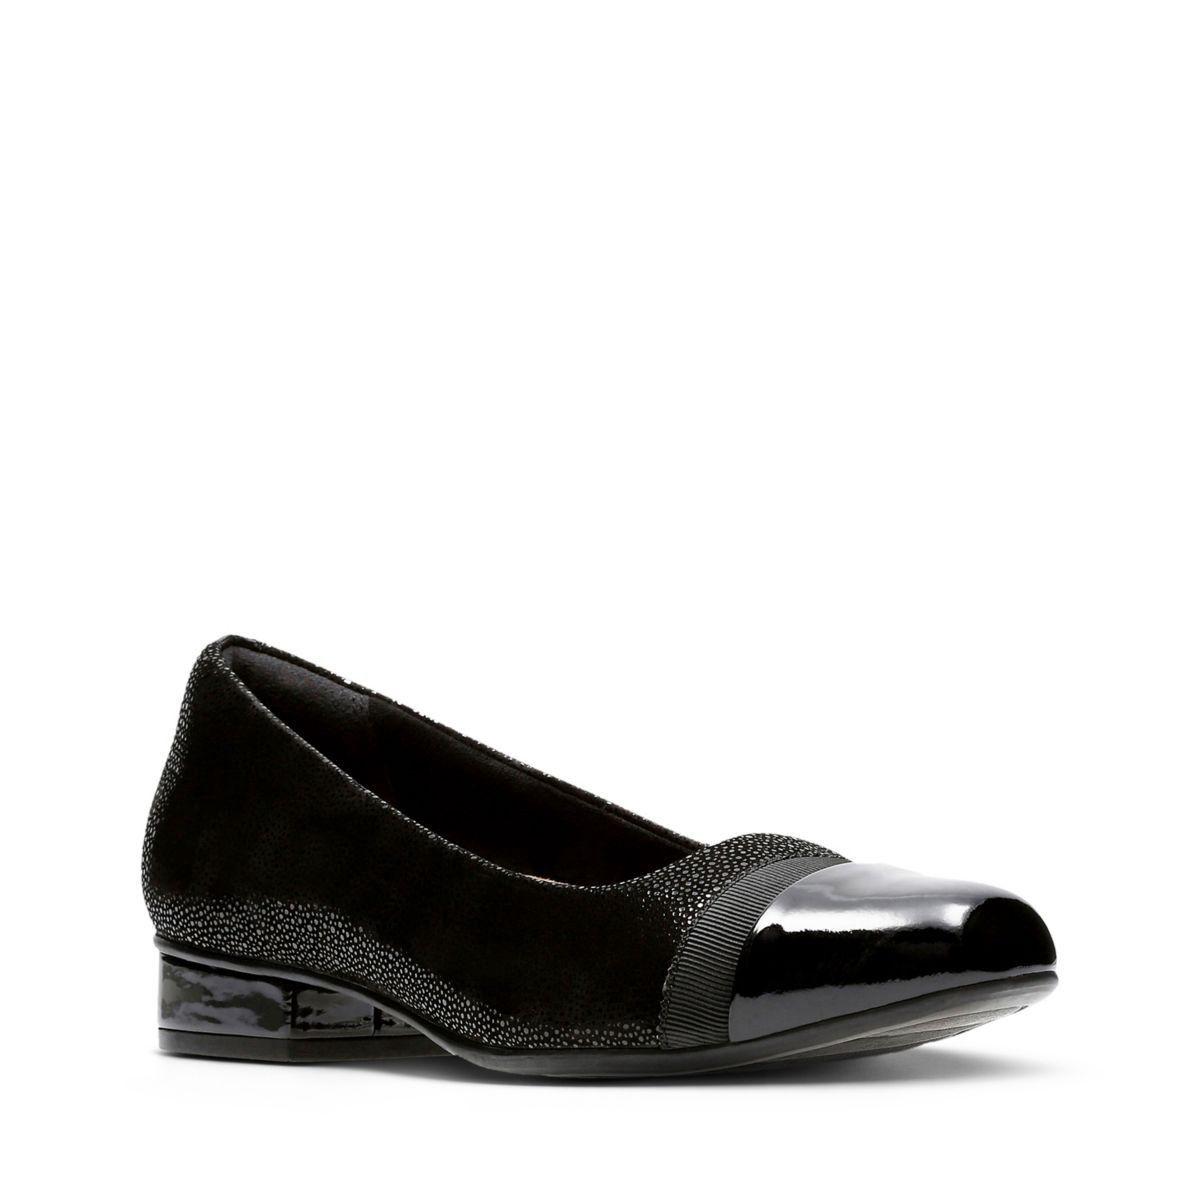 Clarks Keesha Rosa - Womens Shoes Black